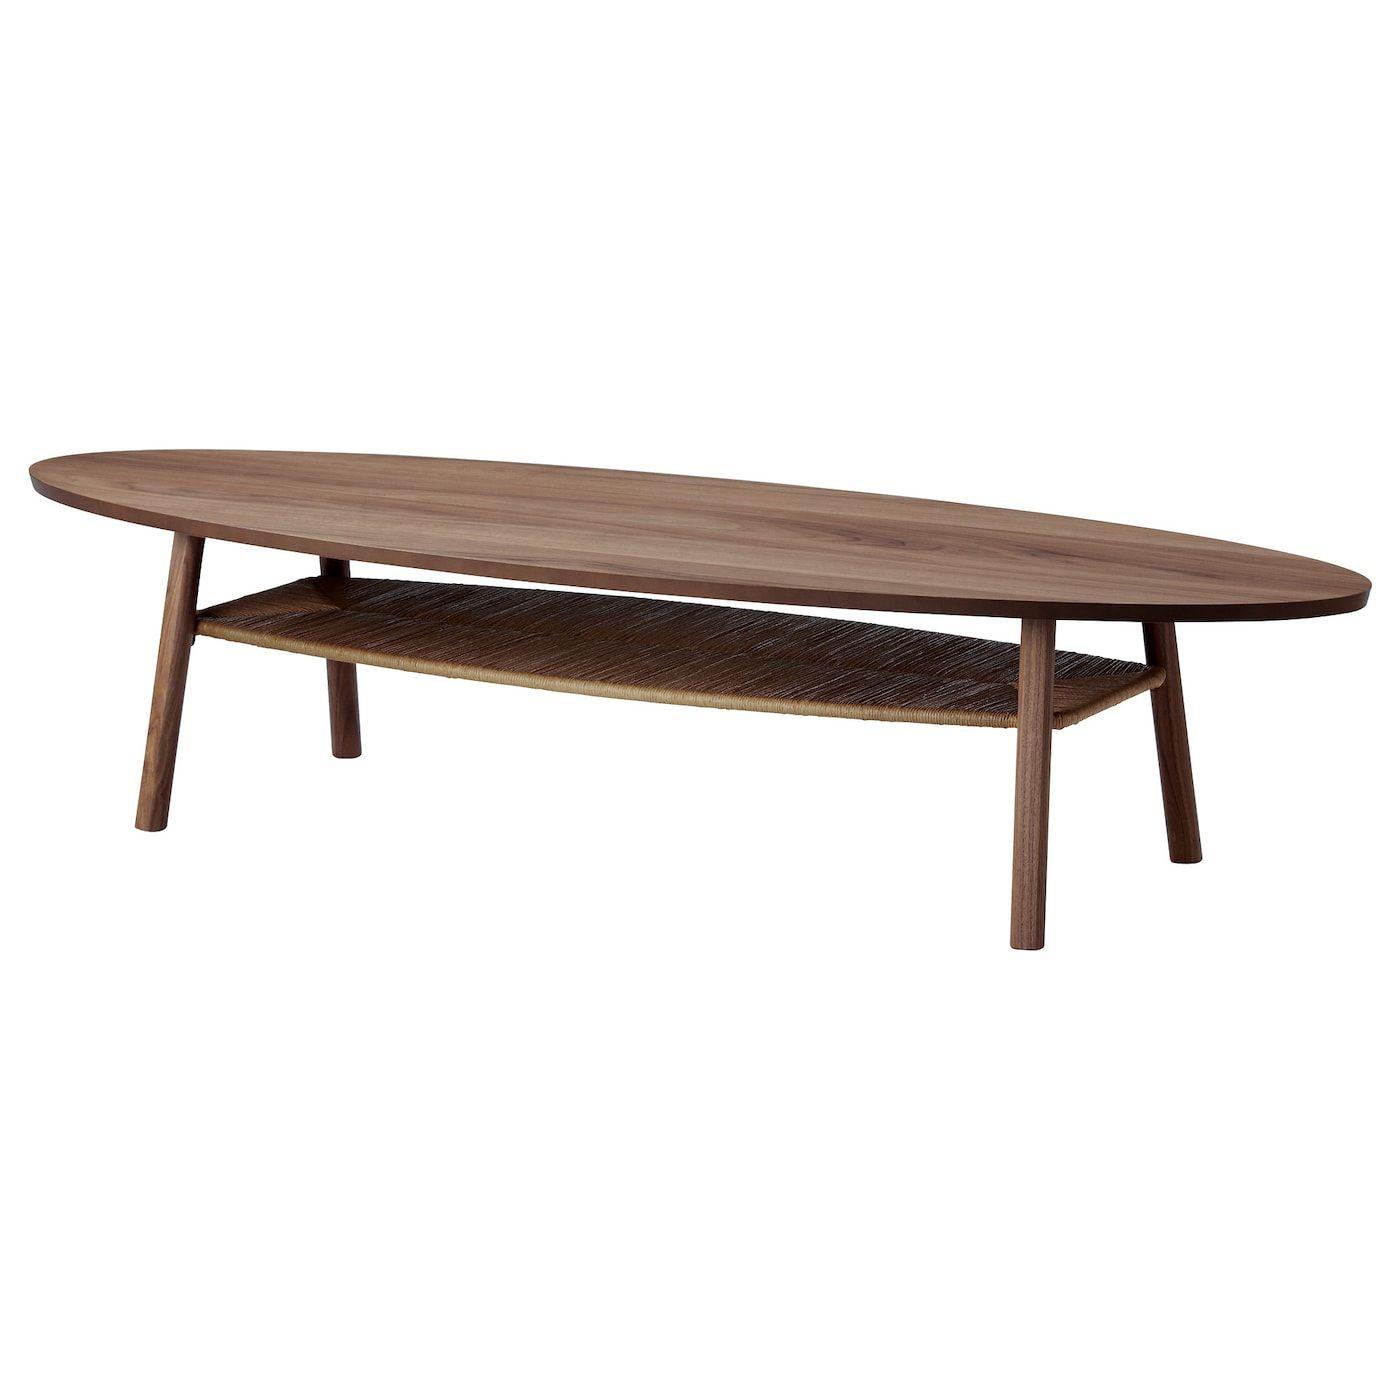 Stockholm Coffee Table Walnut Veneer 70 7 8x23 1 4 Ikea In 2020 Ikea Coffee Table Coffee Table Living Room Table [ 1400 x 1400 Pixel ]